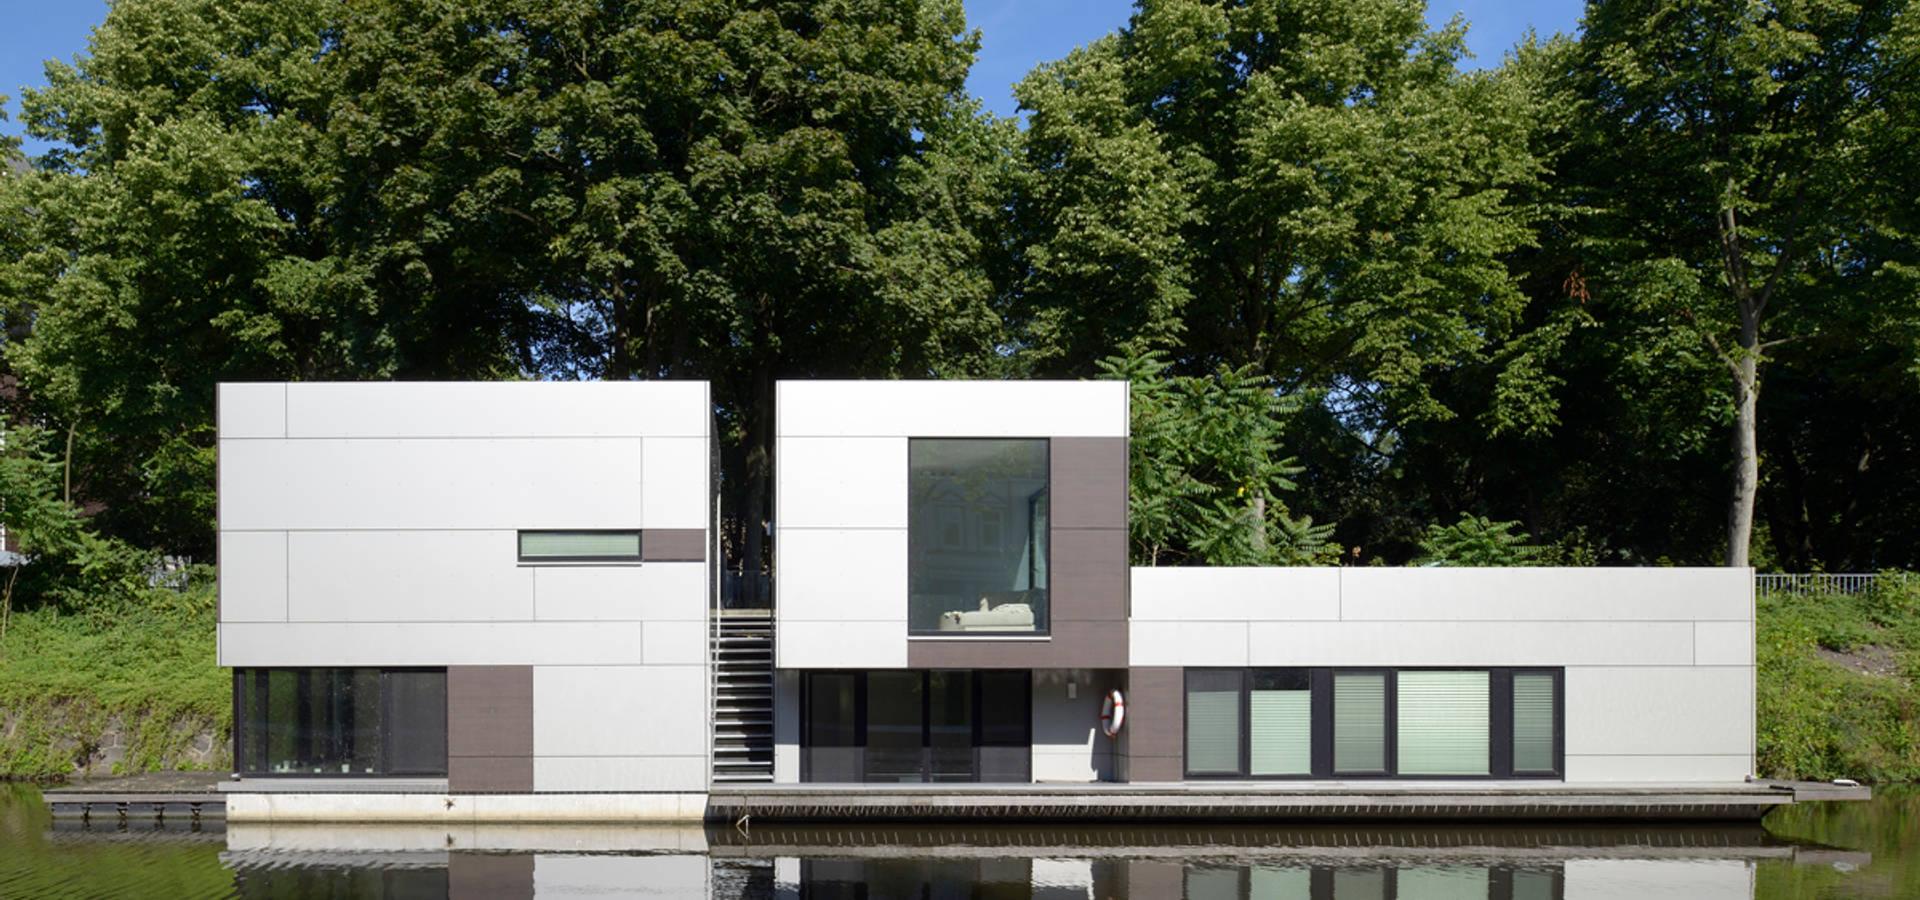 Hamburg Architekt hausboot am eilbekkanal hamburg by dfz architekten homify